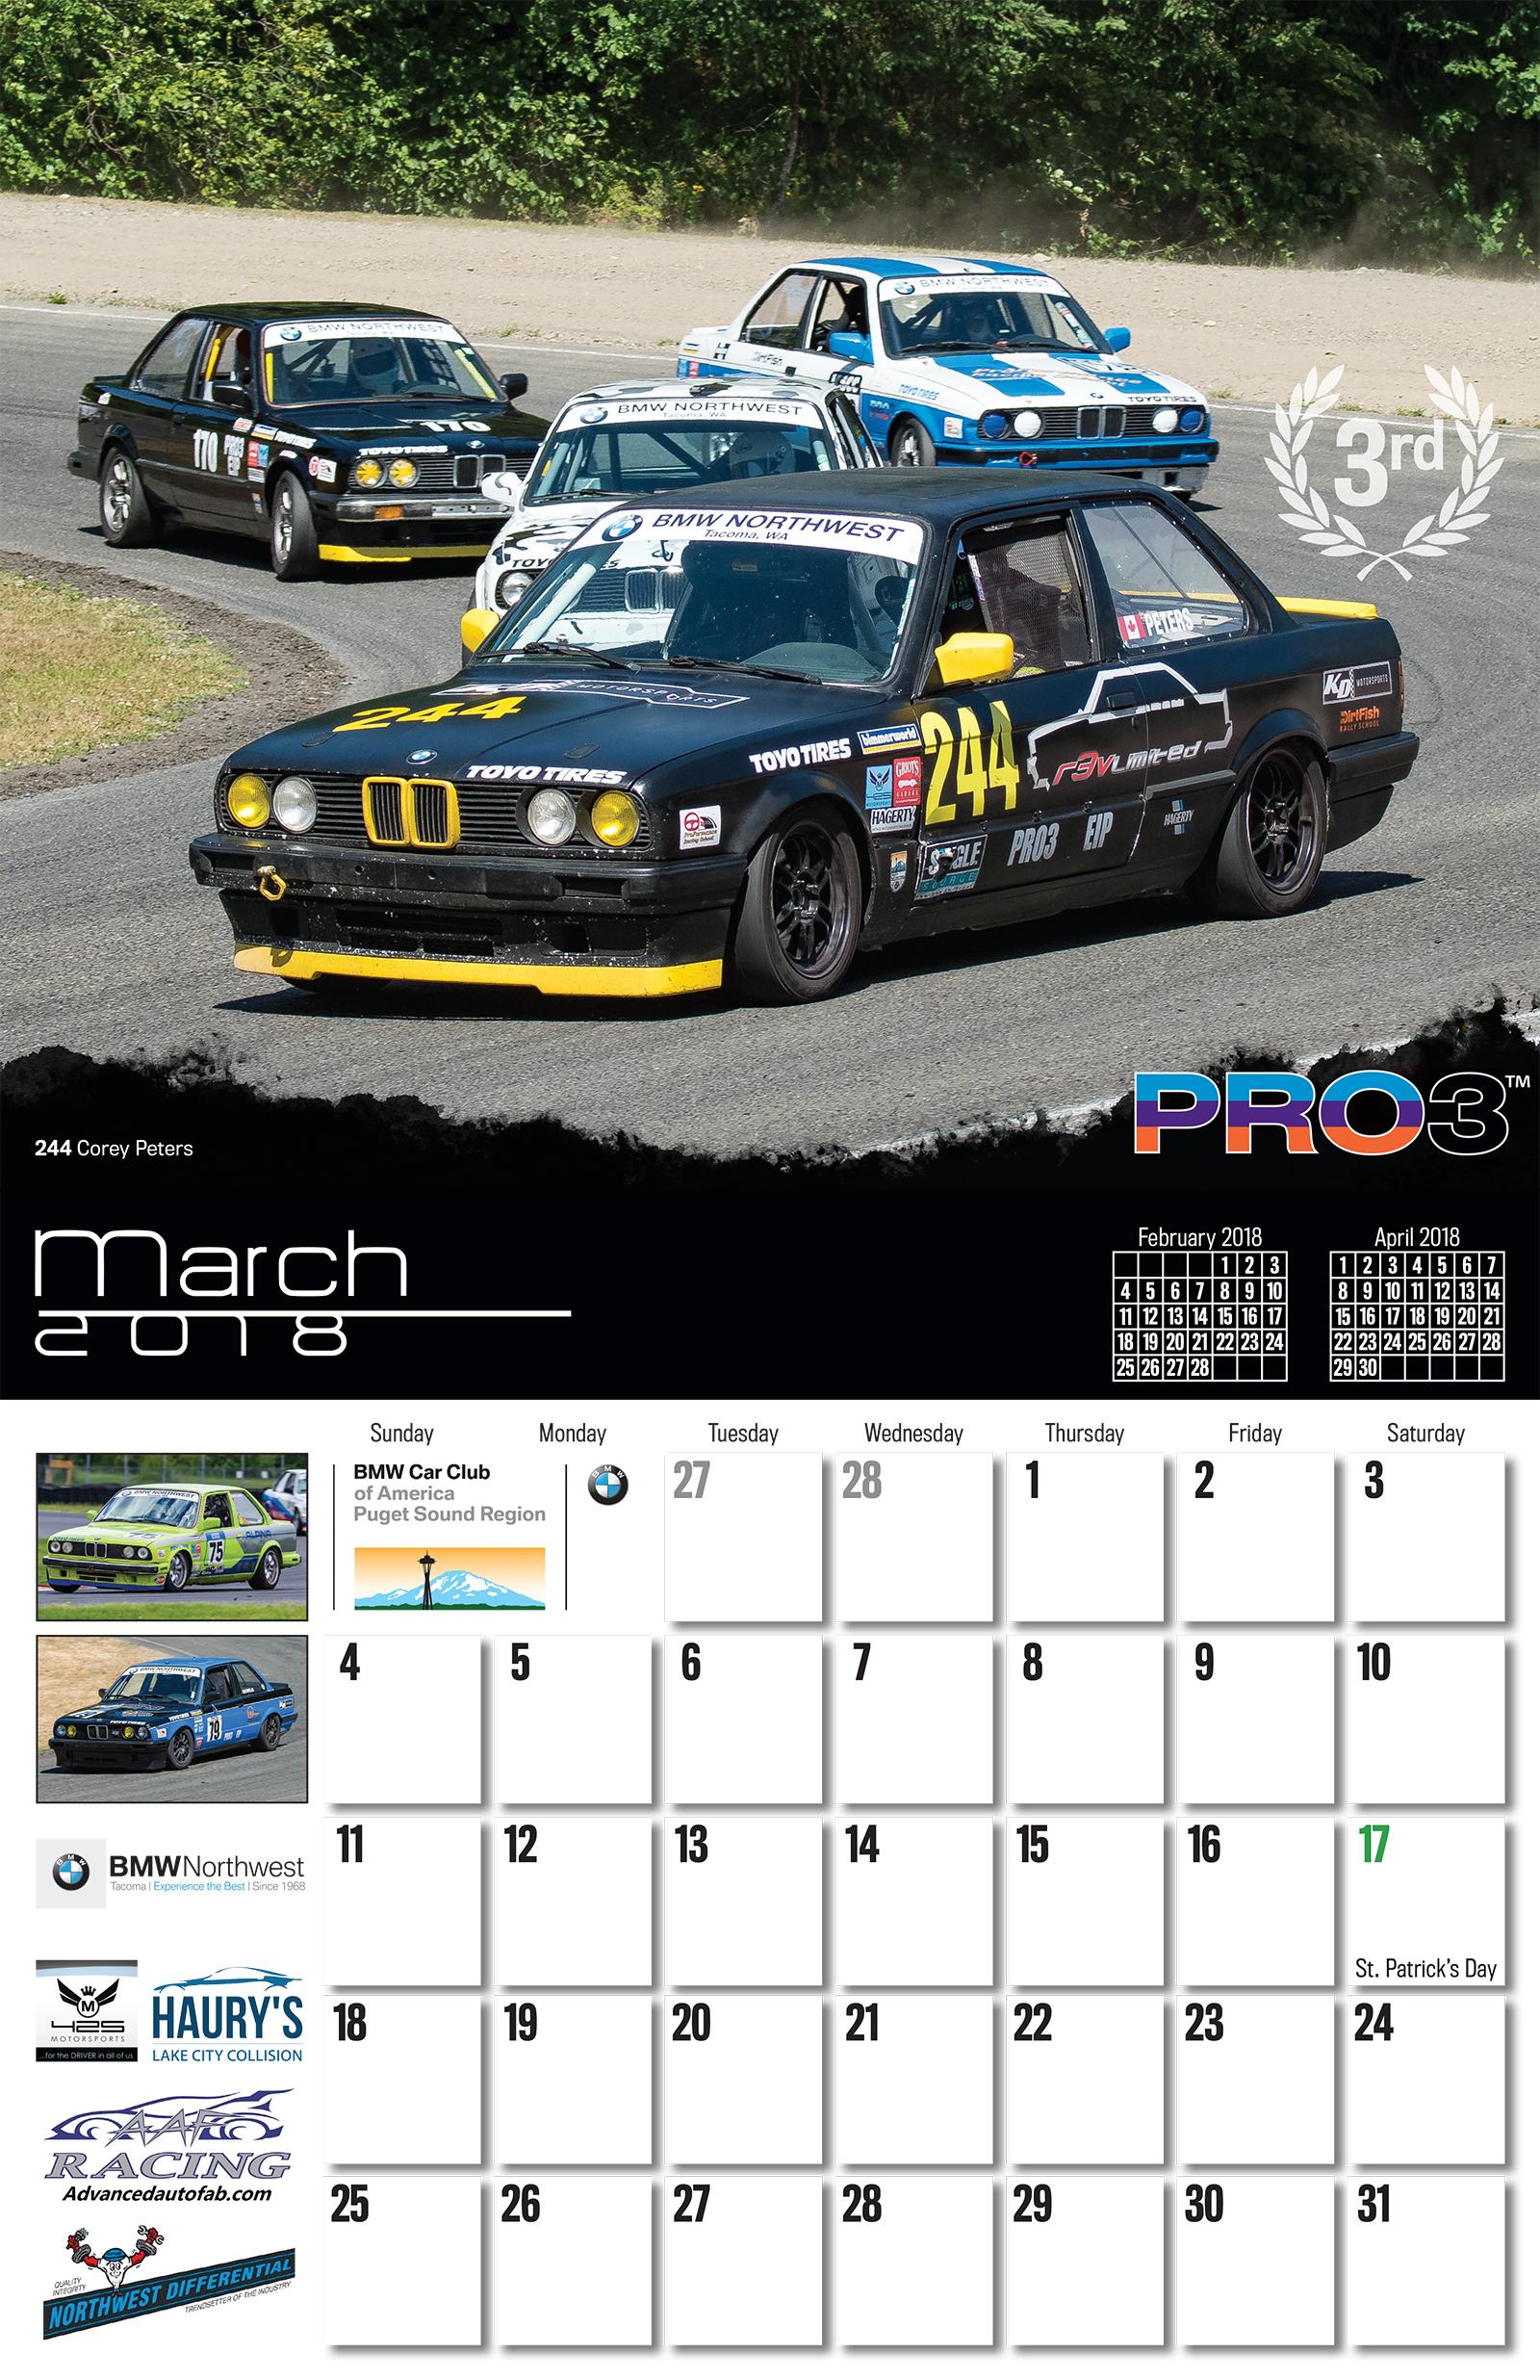 PRO3_Calendar_2018_03-Mar.jpg